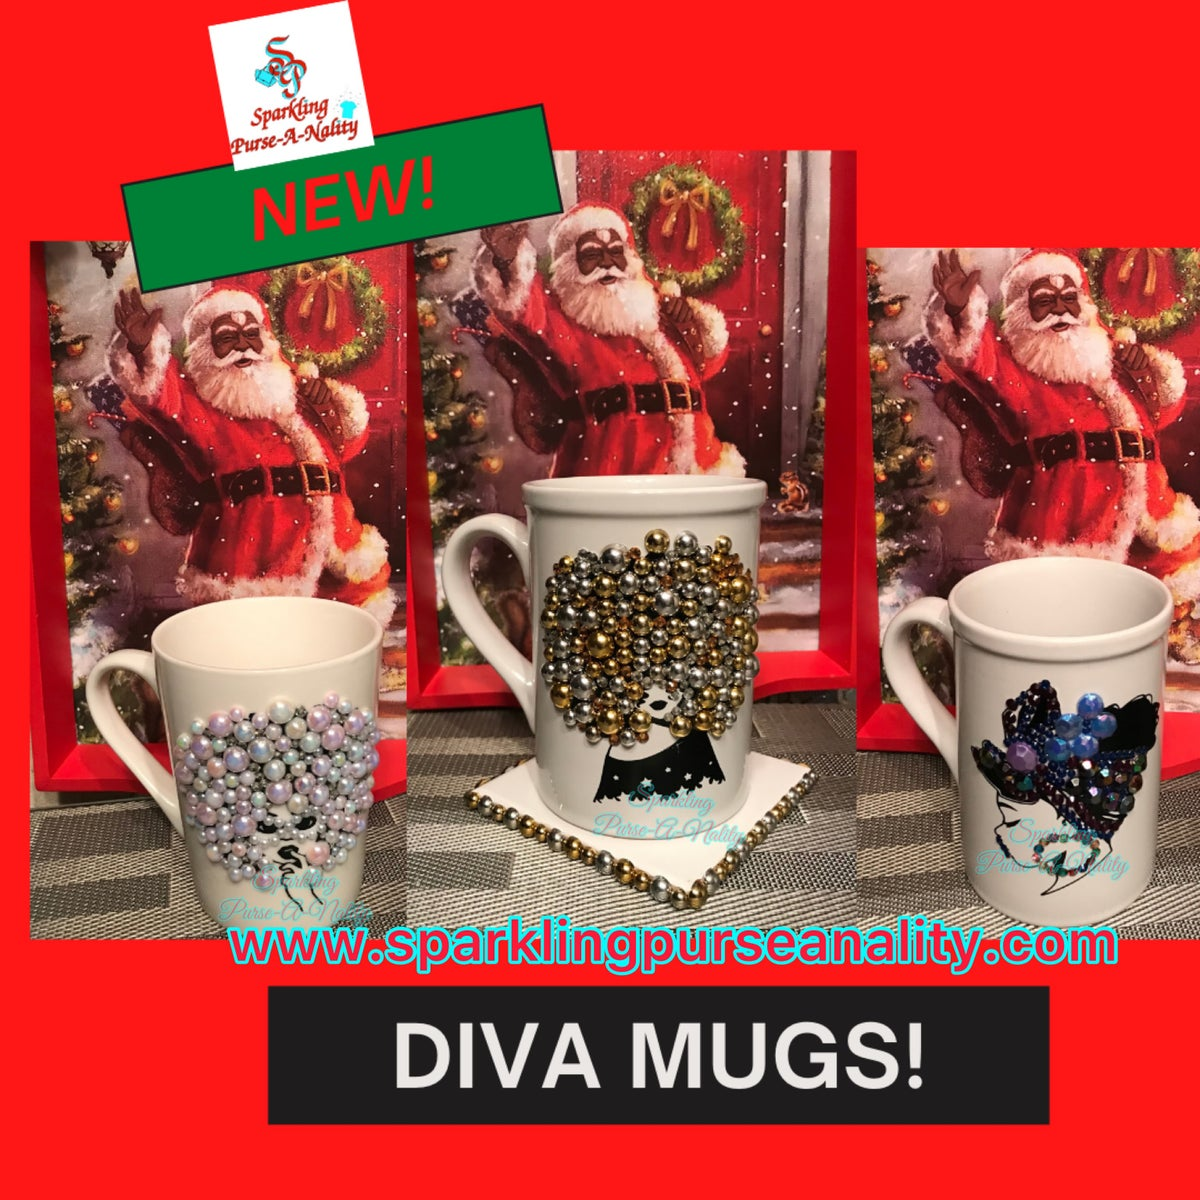 Image of Sparkling Diva Mugs